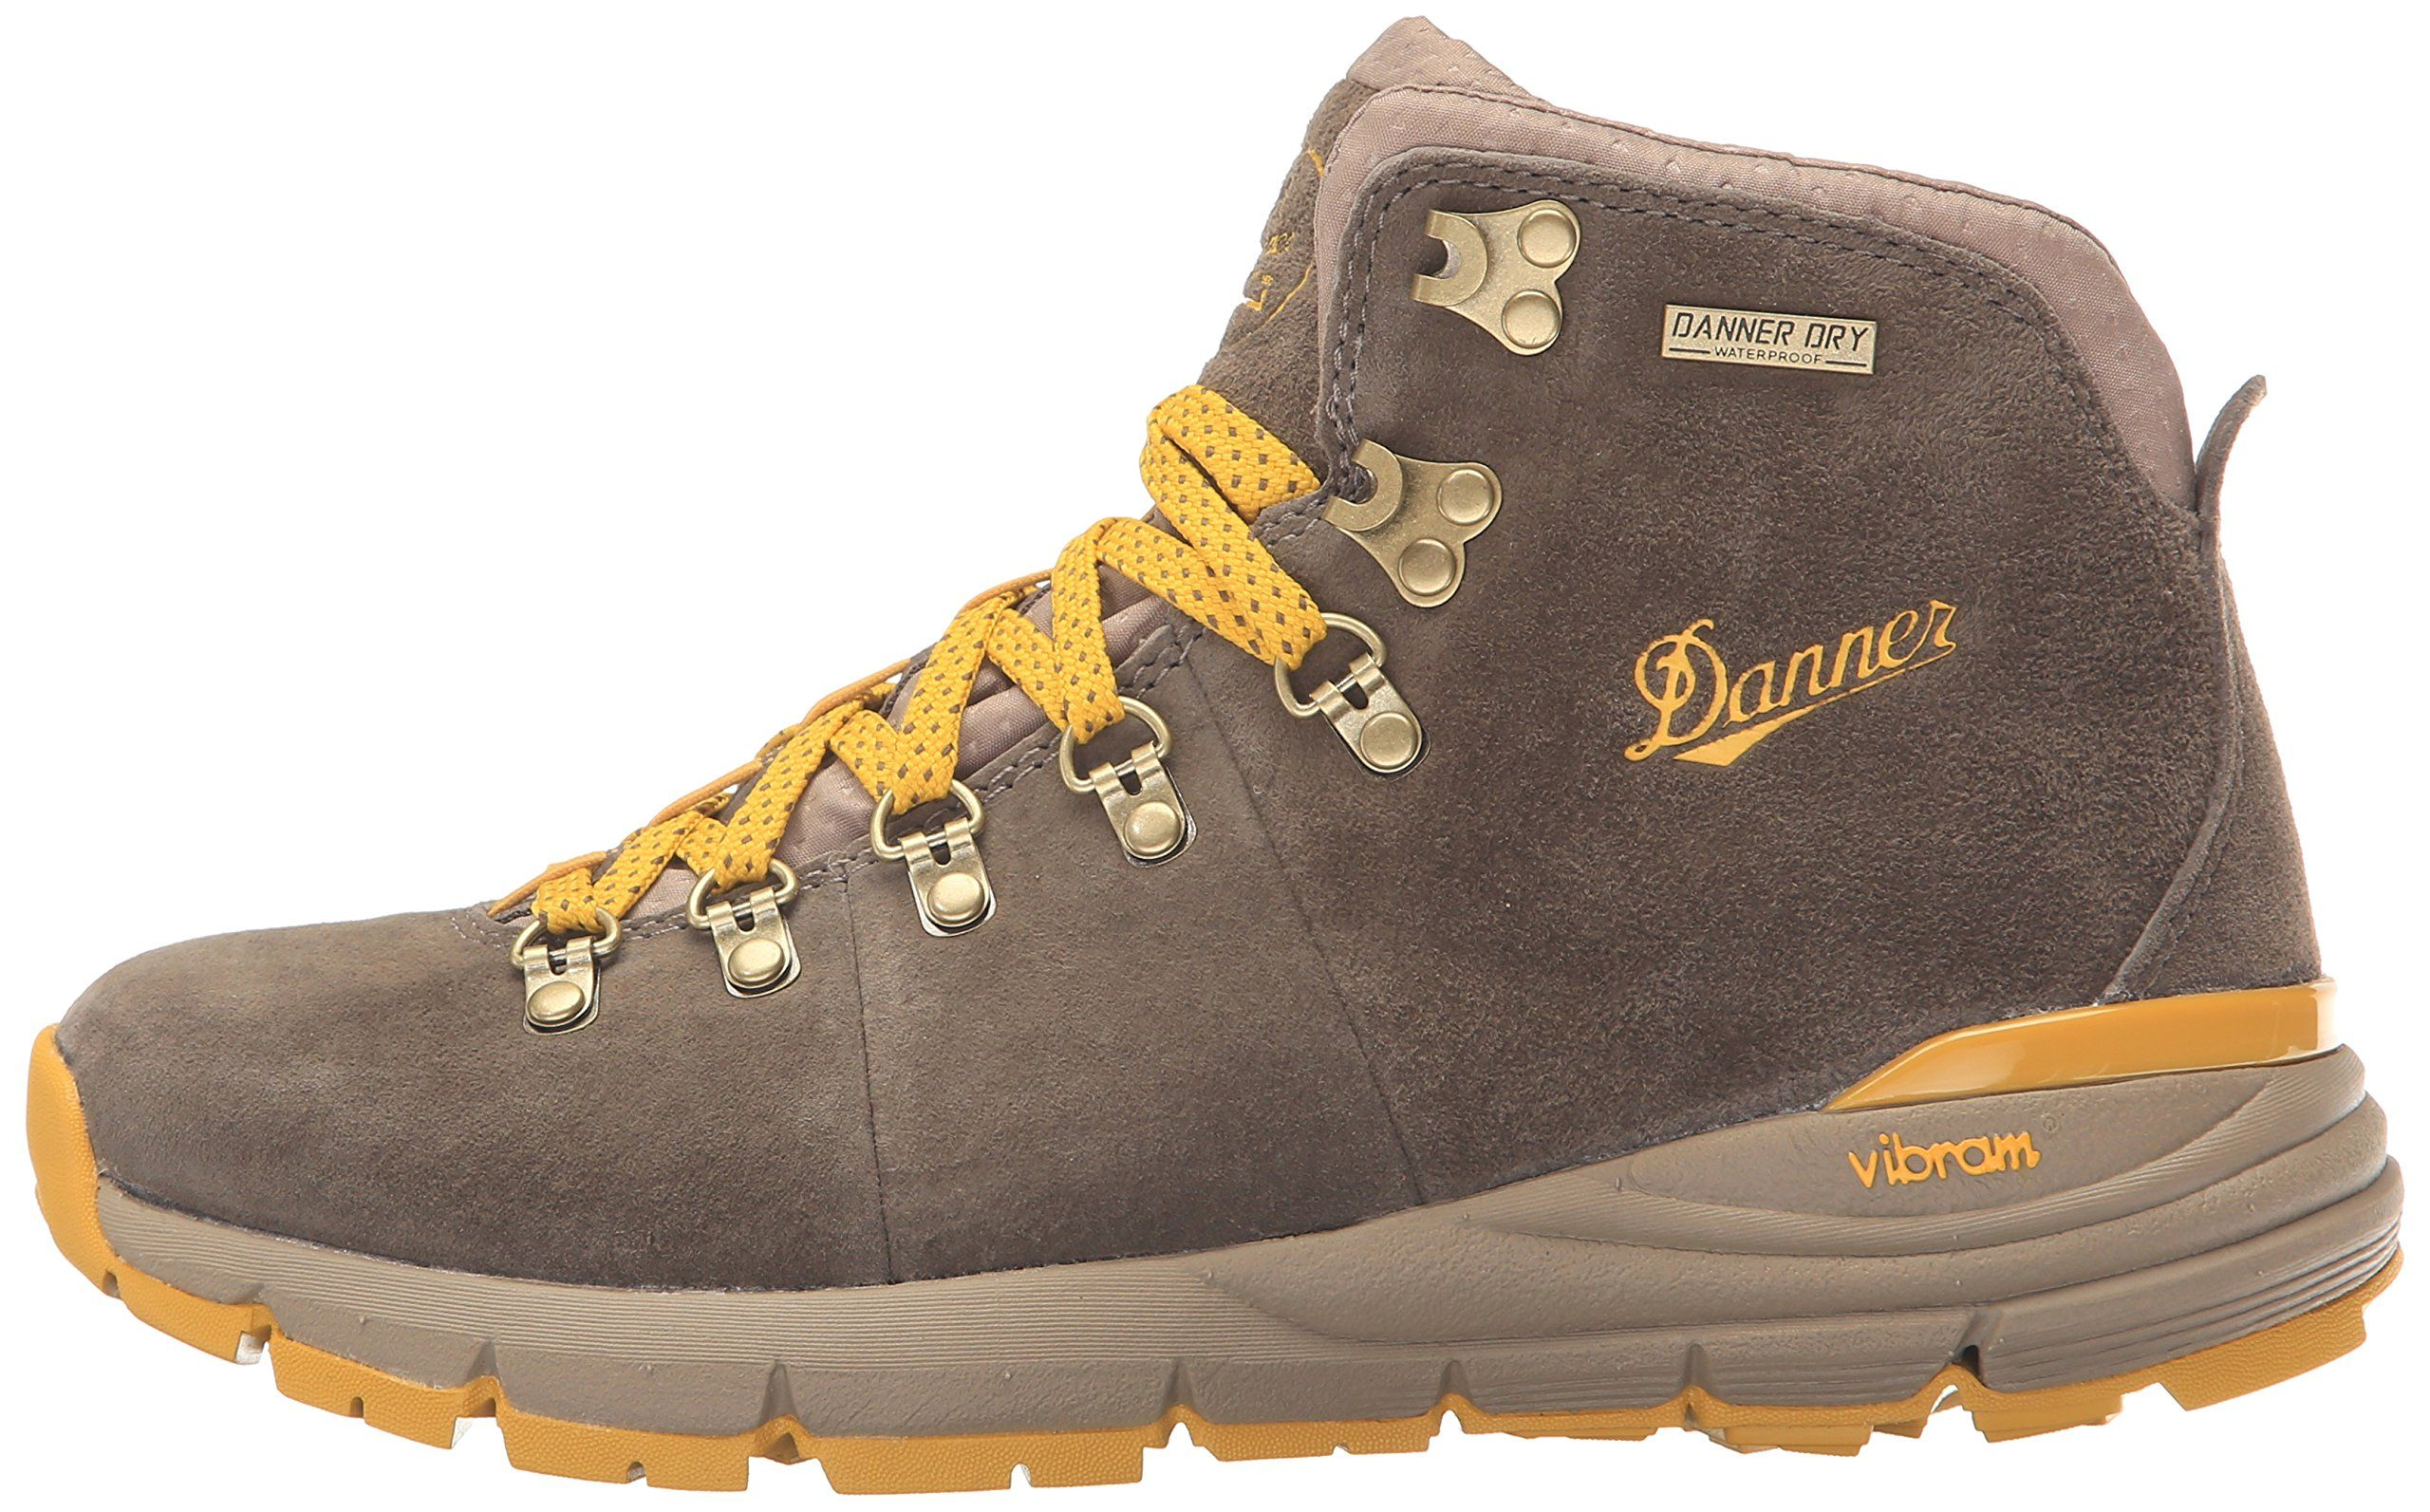 4674d3137bd Danner Womens Mountain 600 4.5 Hiking Boot Hazelwood/Yellow 7.5 M US ...